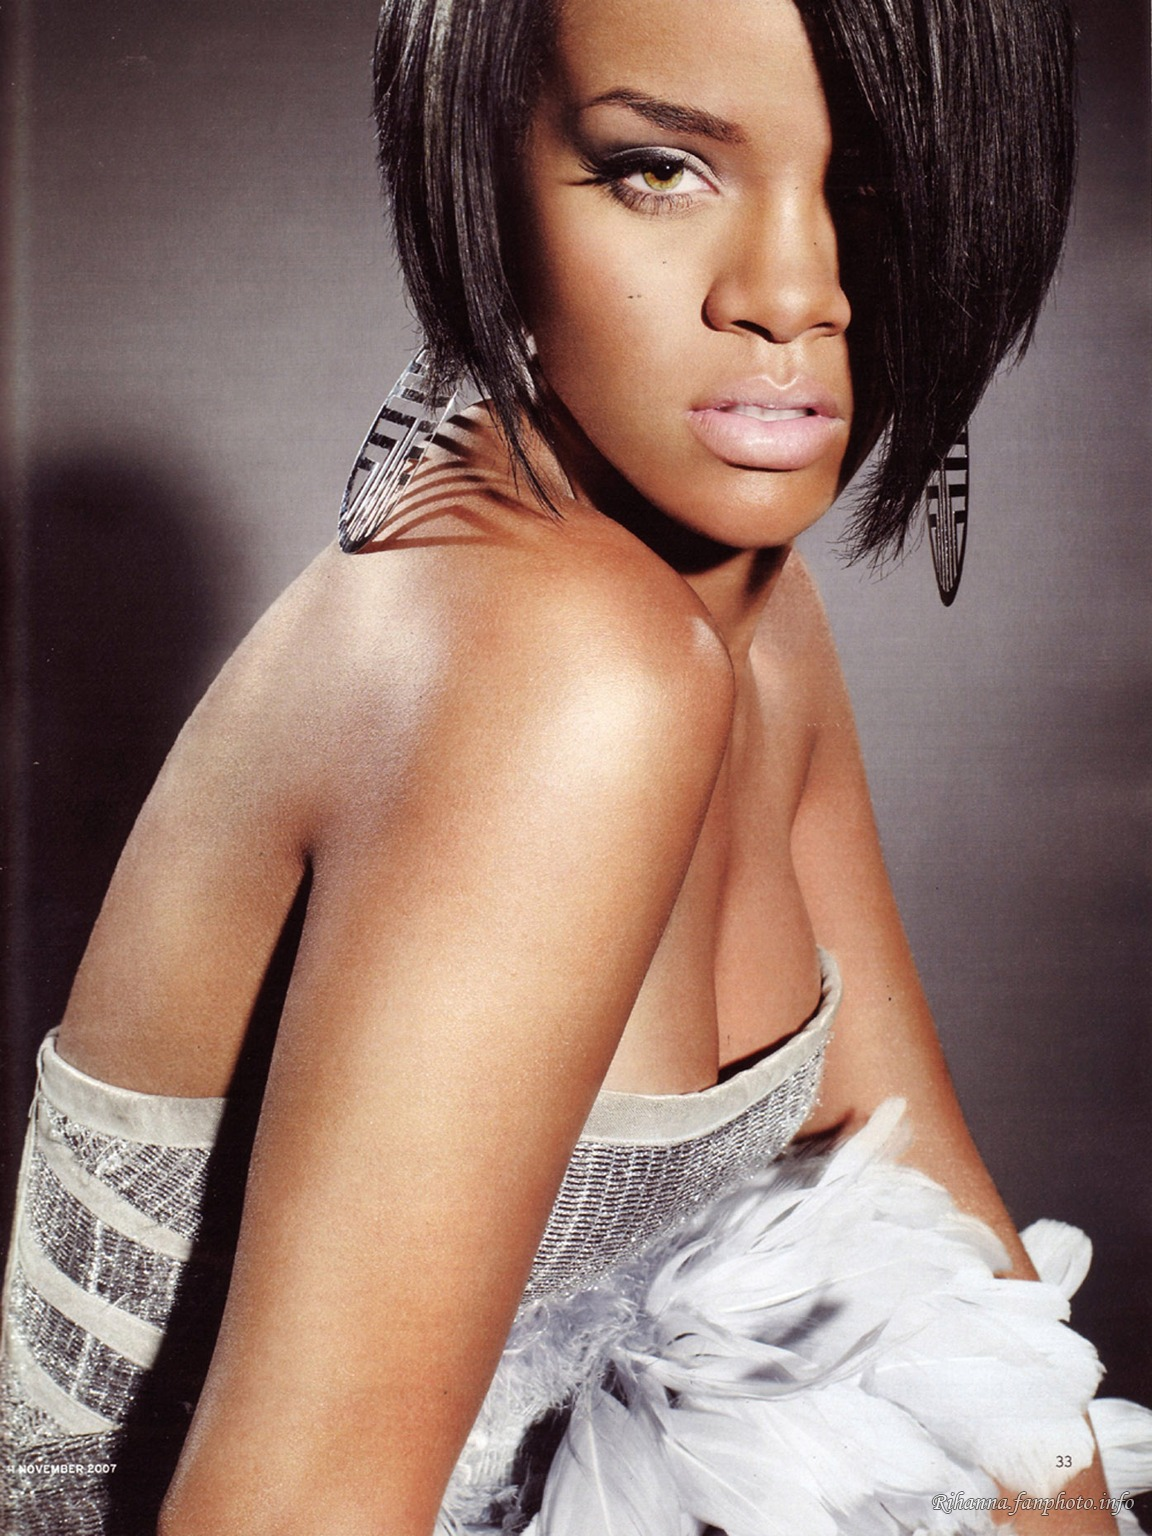 Rihanna Reveals Details About Nicki Minaj Collaboration